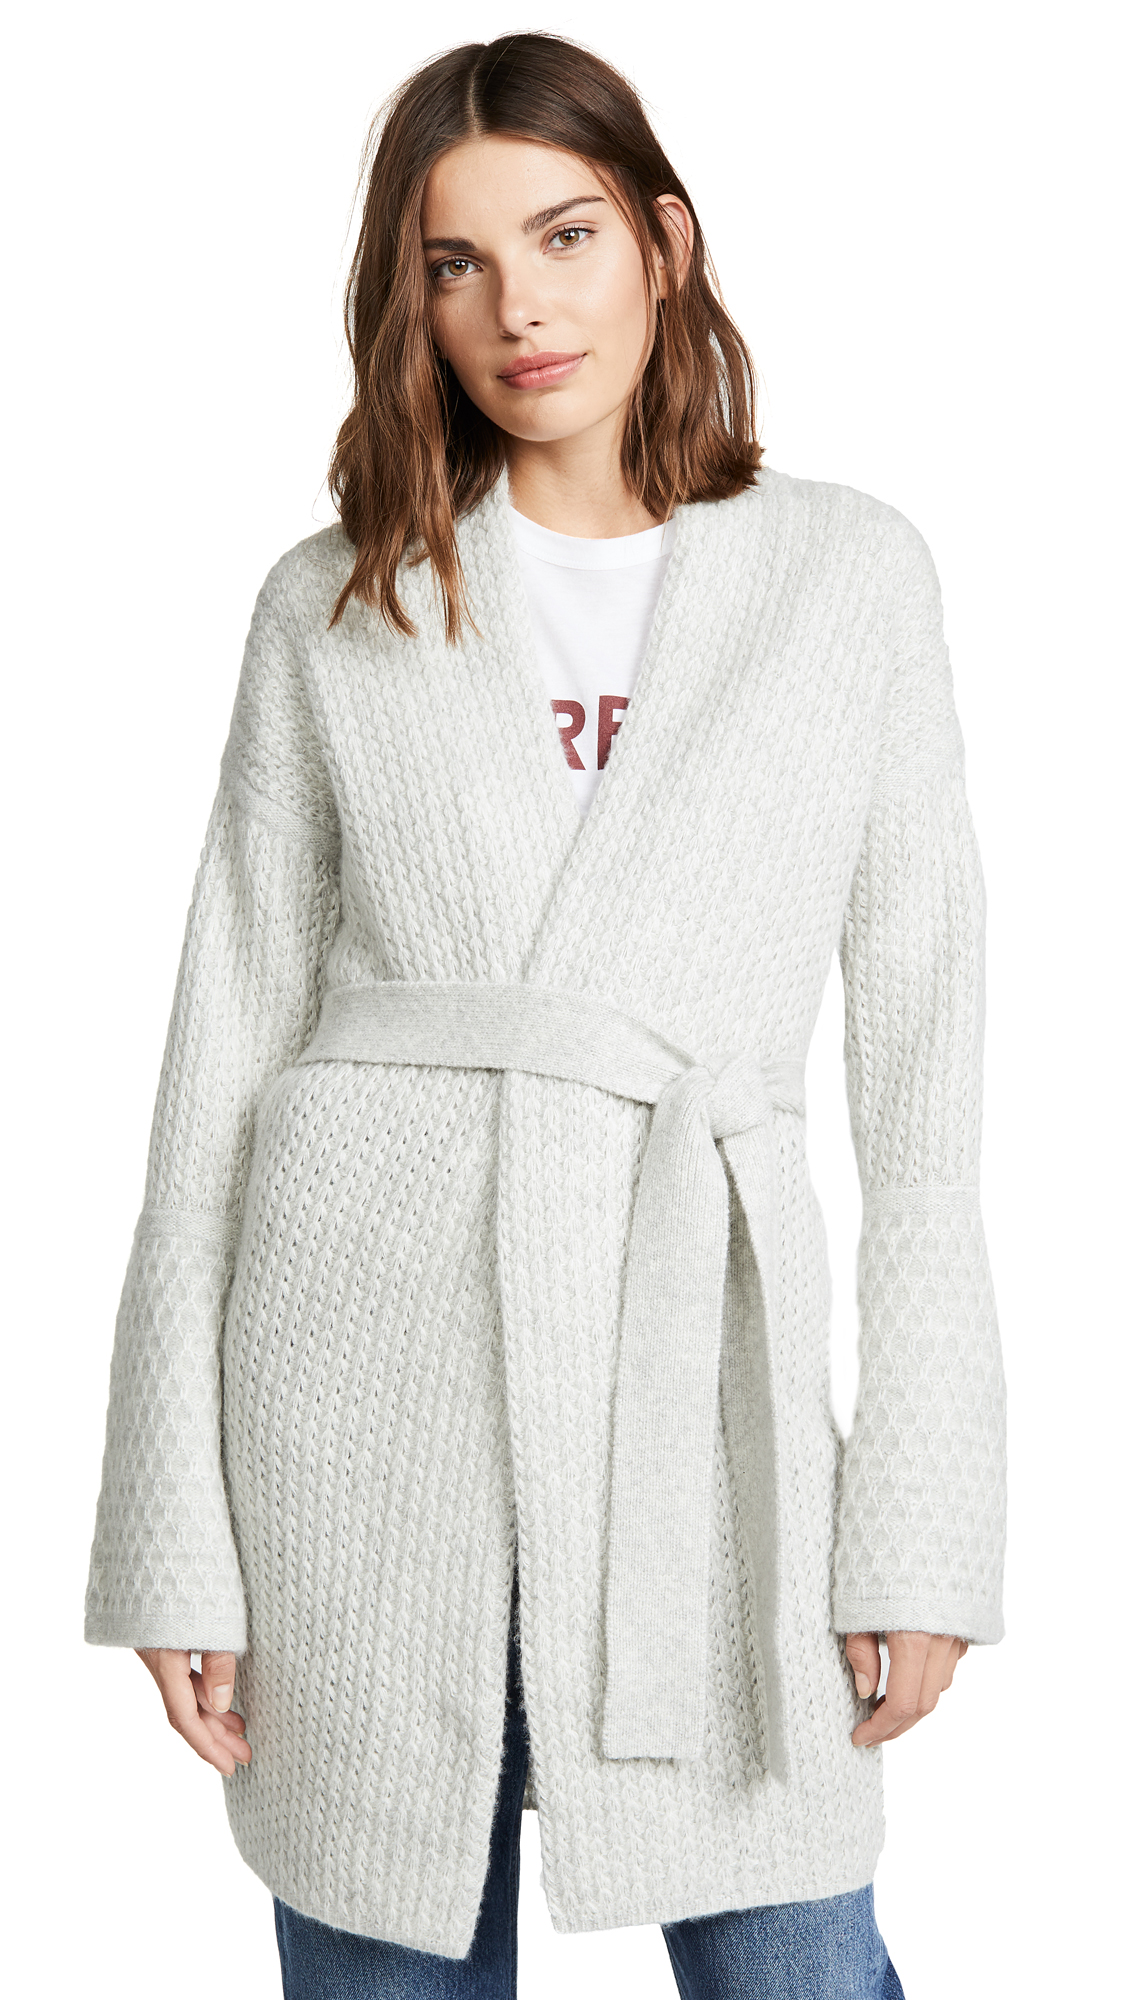 TSE Cashmere Cashmere Sweater Coat with Belt In Ice Grey Melange